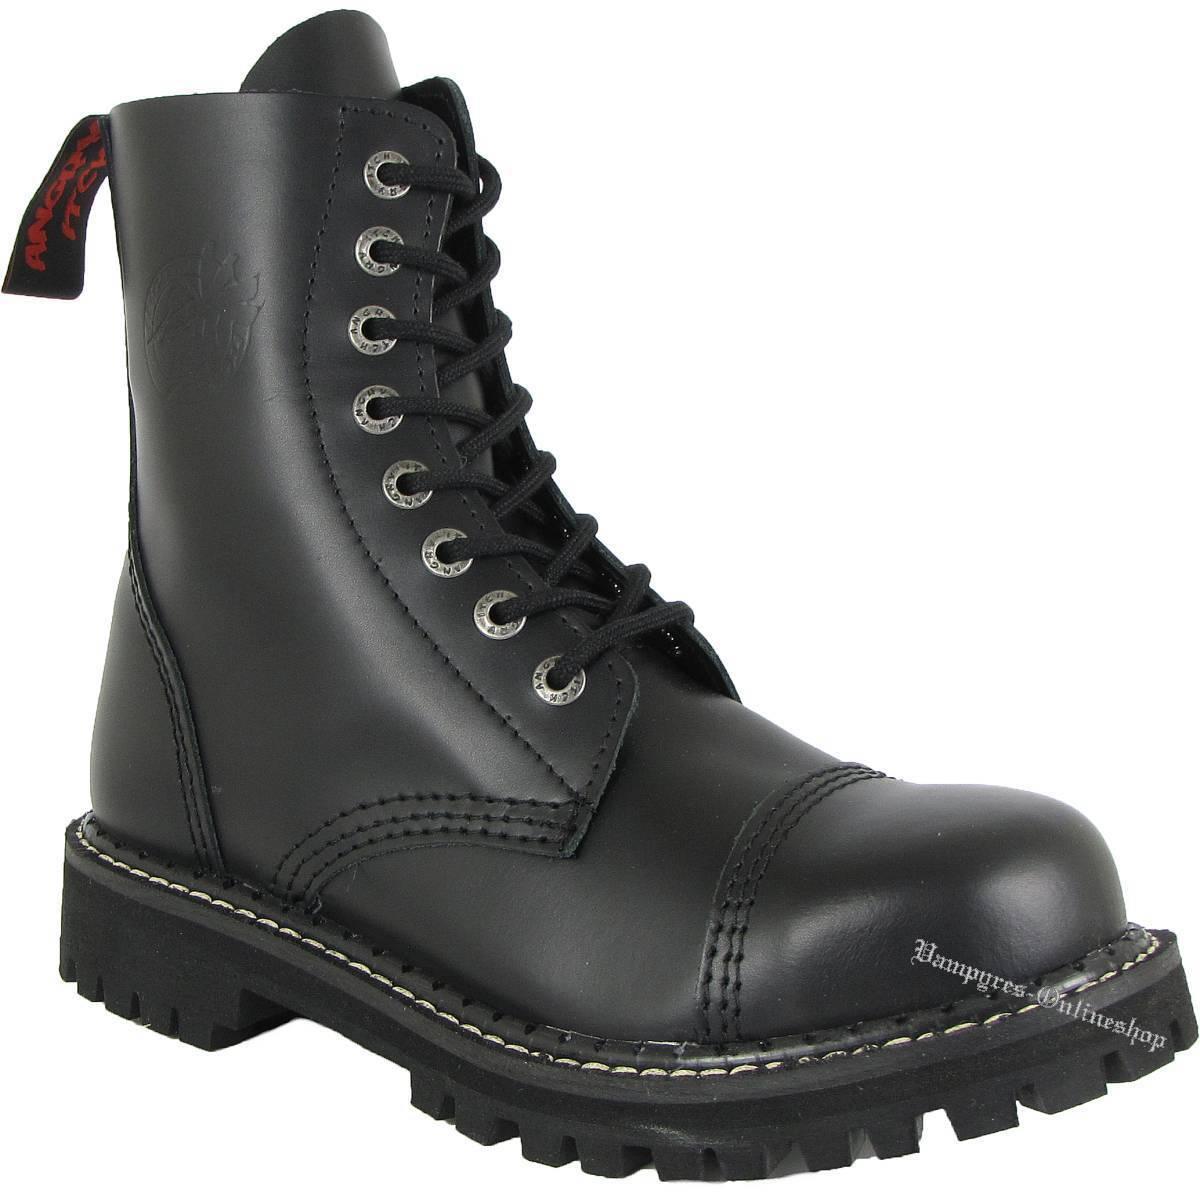 Angry Itch 8-agujero negro rangers botas de cuero acero tapas zapatos botas Black